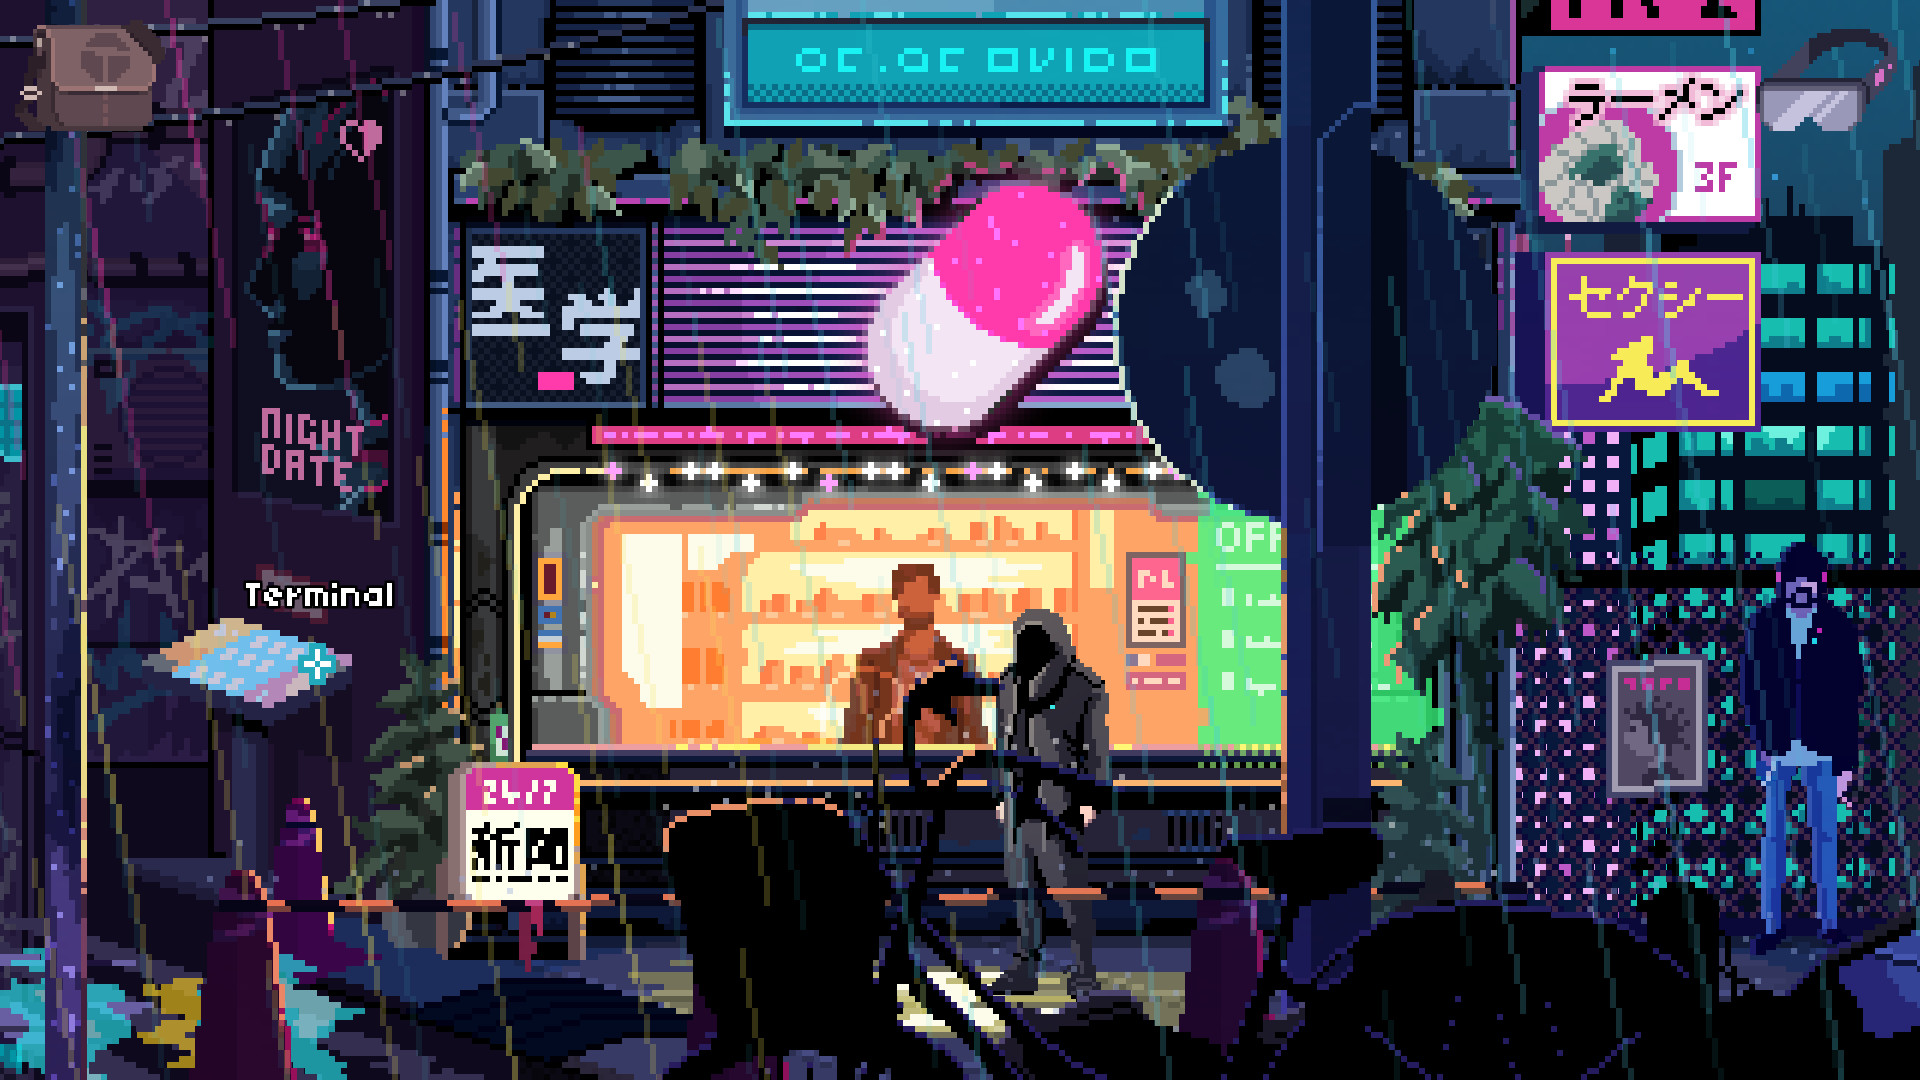 Pill street from Virtua Verse video game